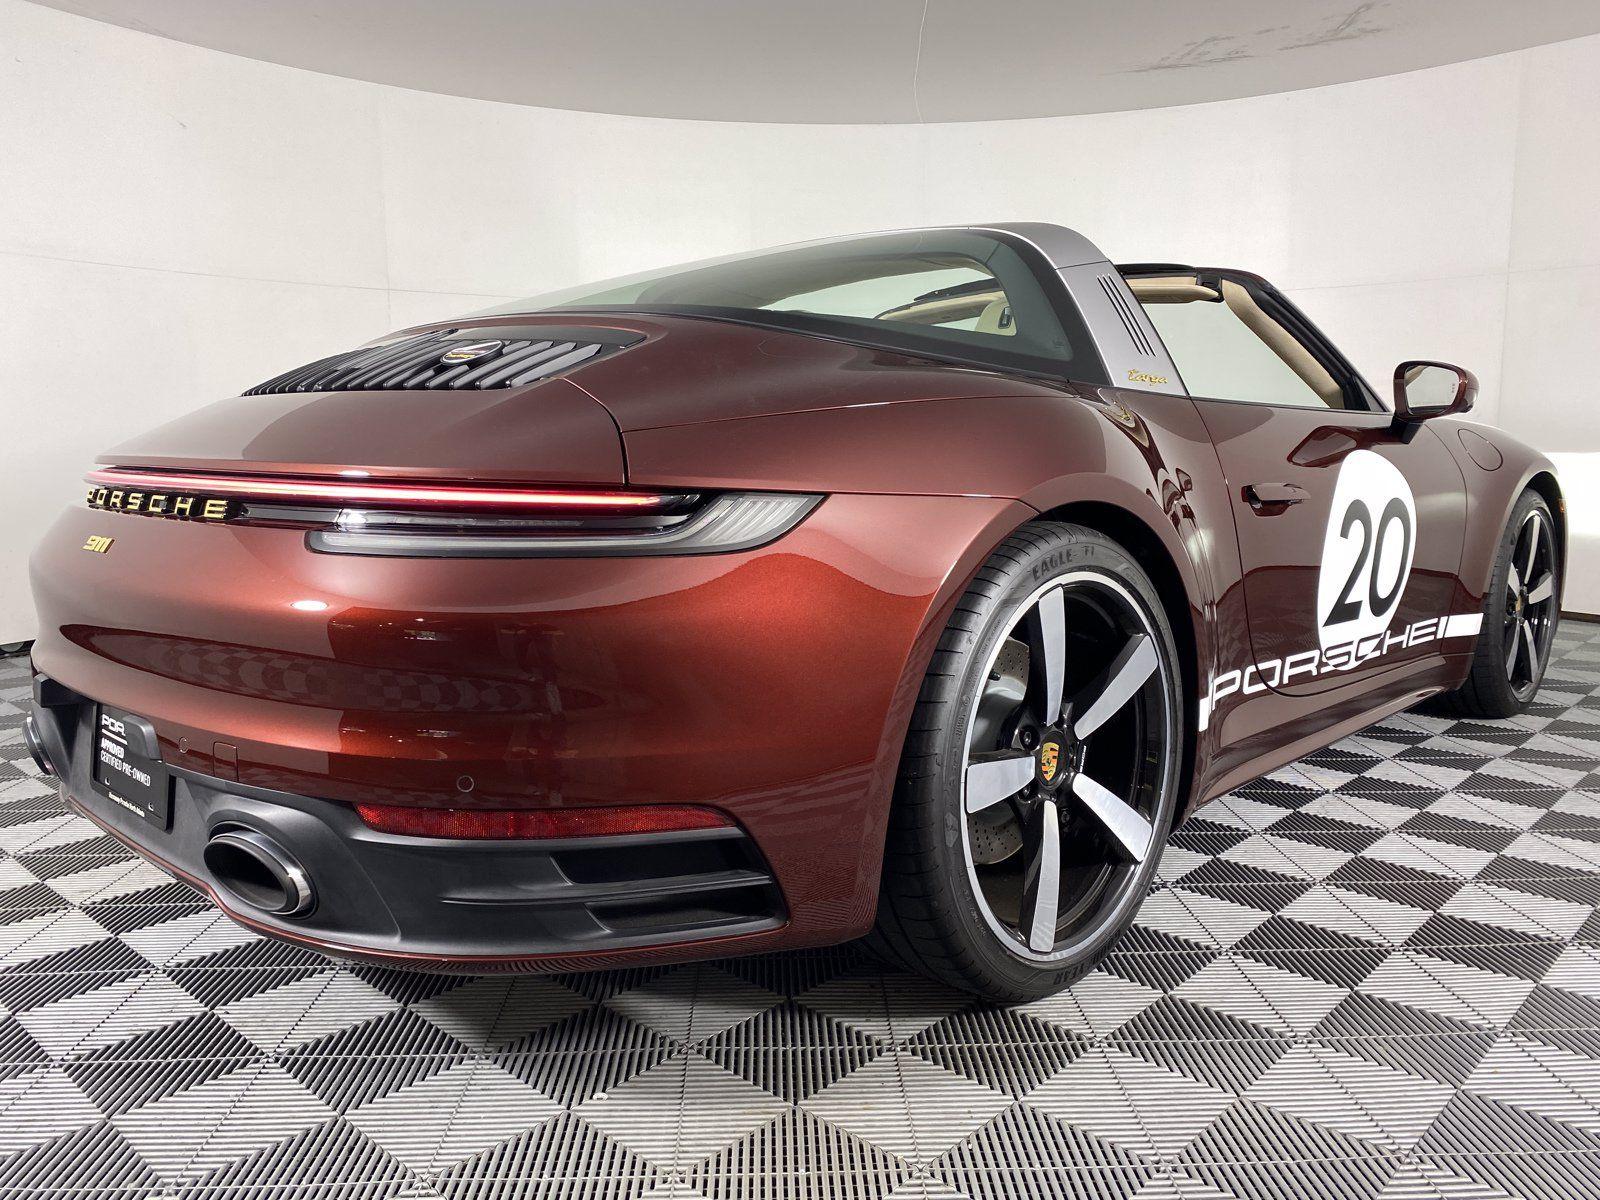 2021 Porsche 911 Targa 4S Heritage Design Edition – 5